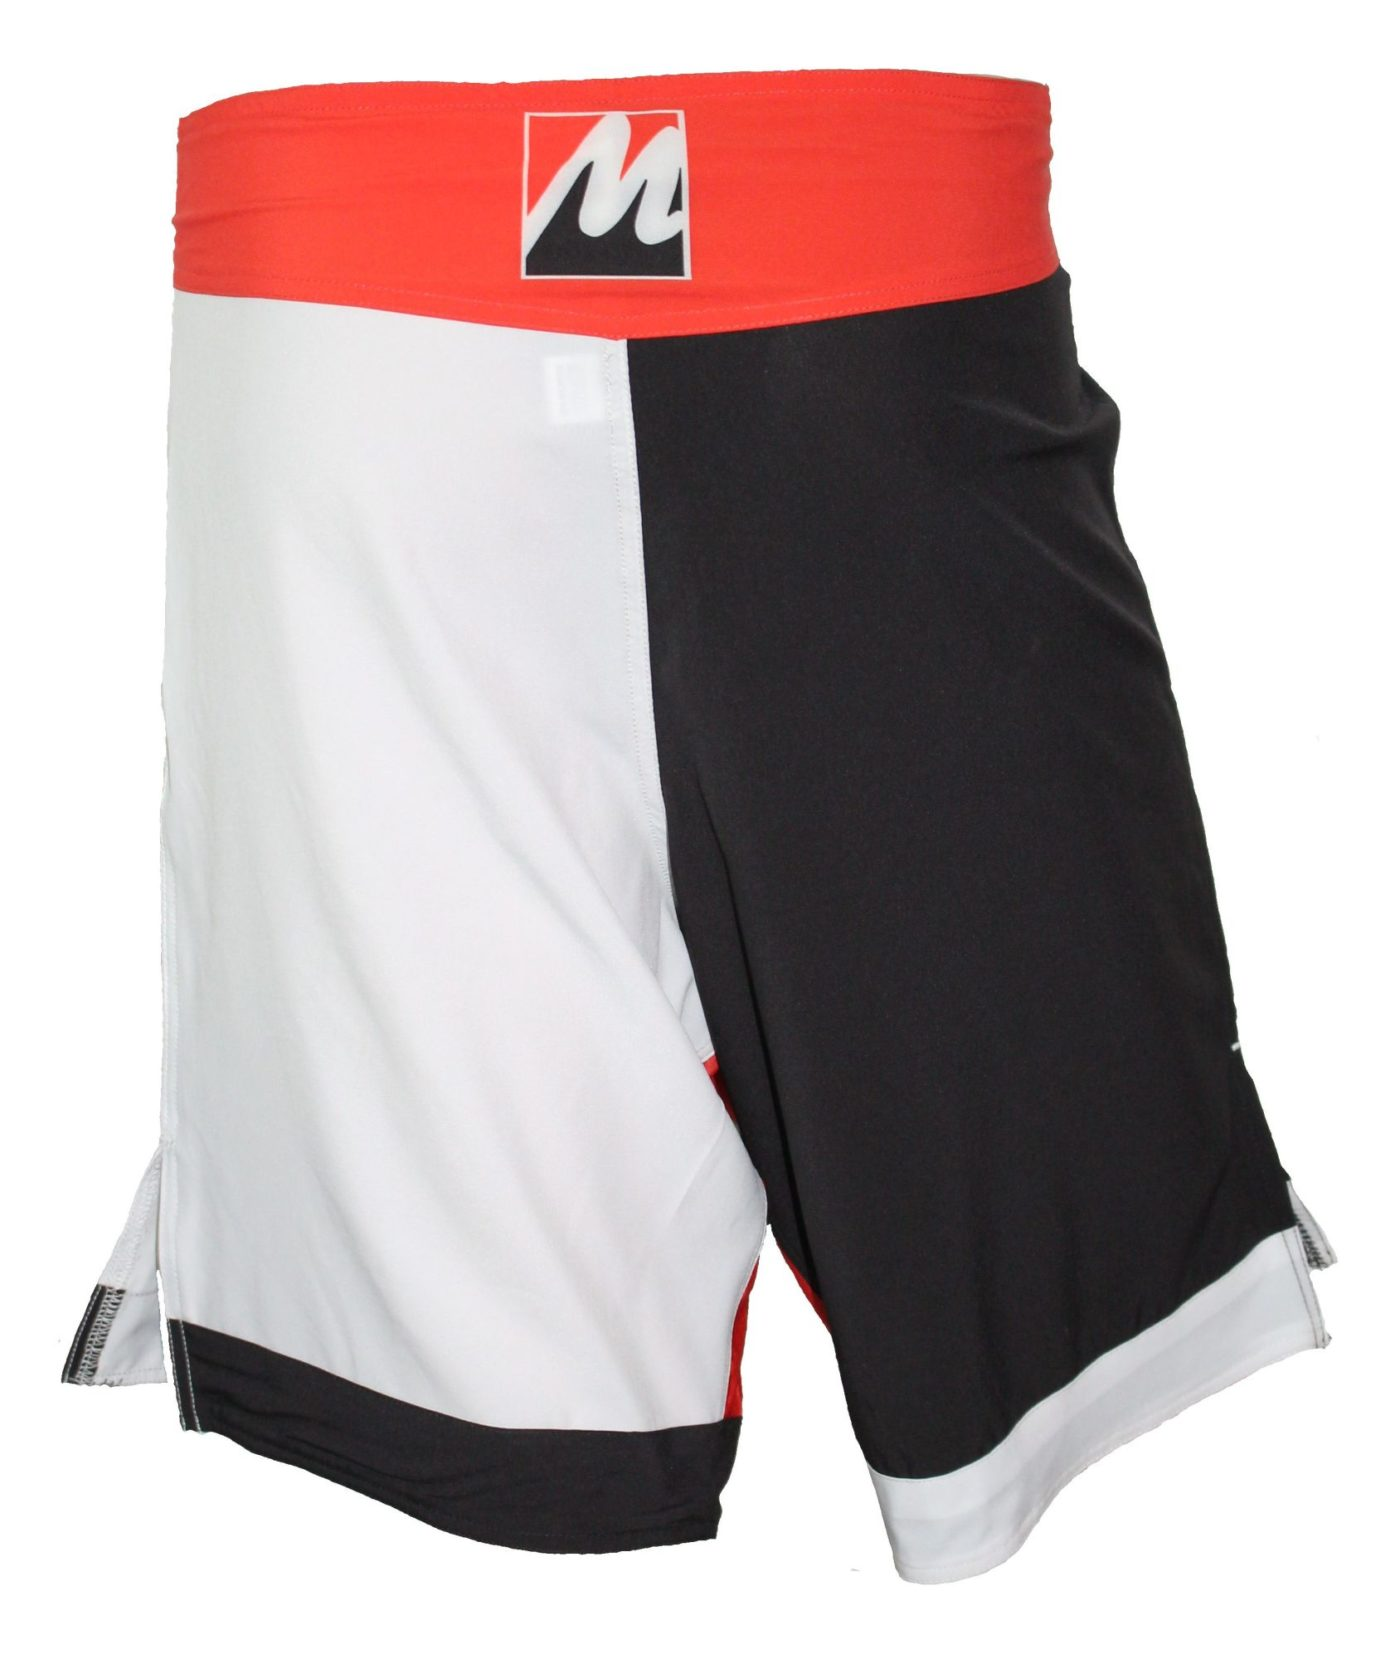 Manus MMA Boksbroekje (Zwart - Wit)